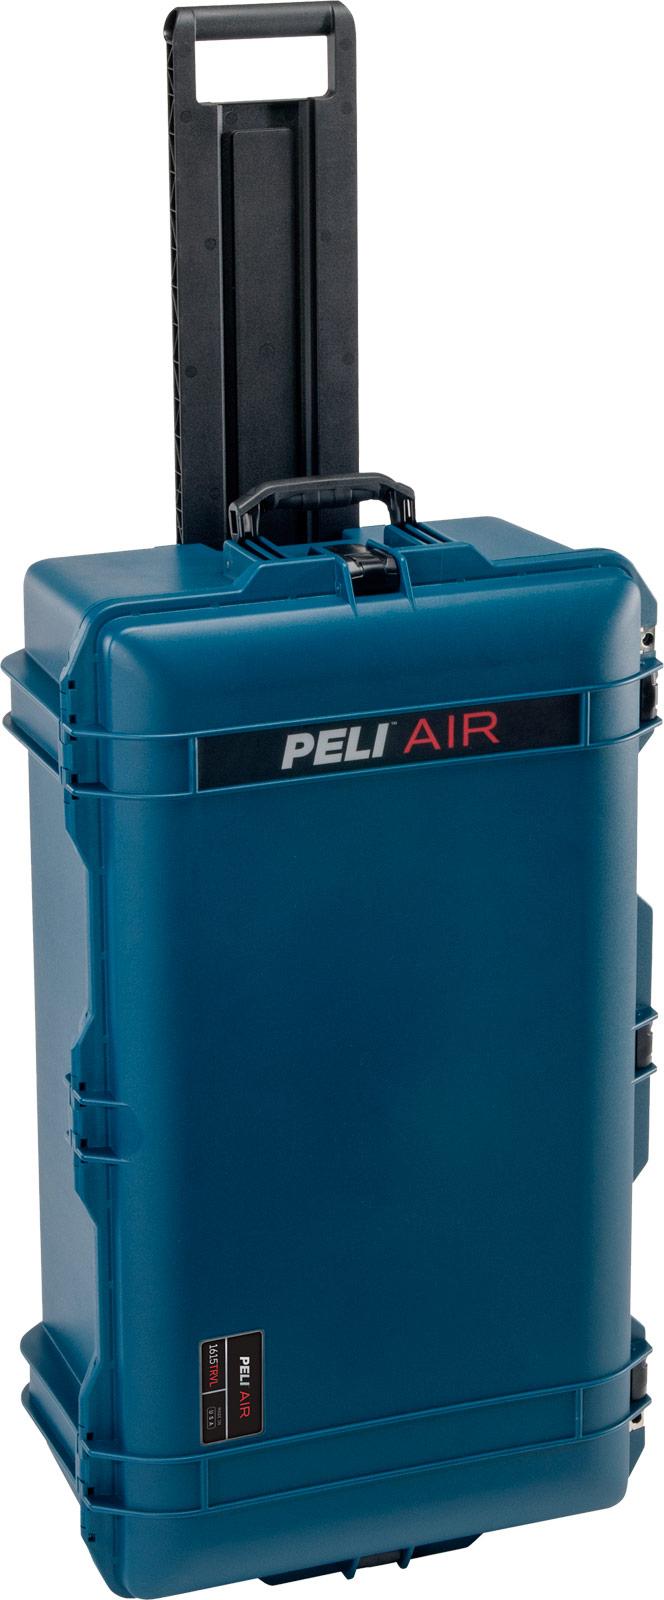 peli air travel luggage tsa case